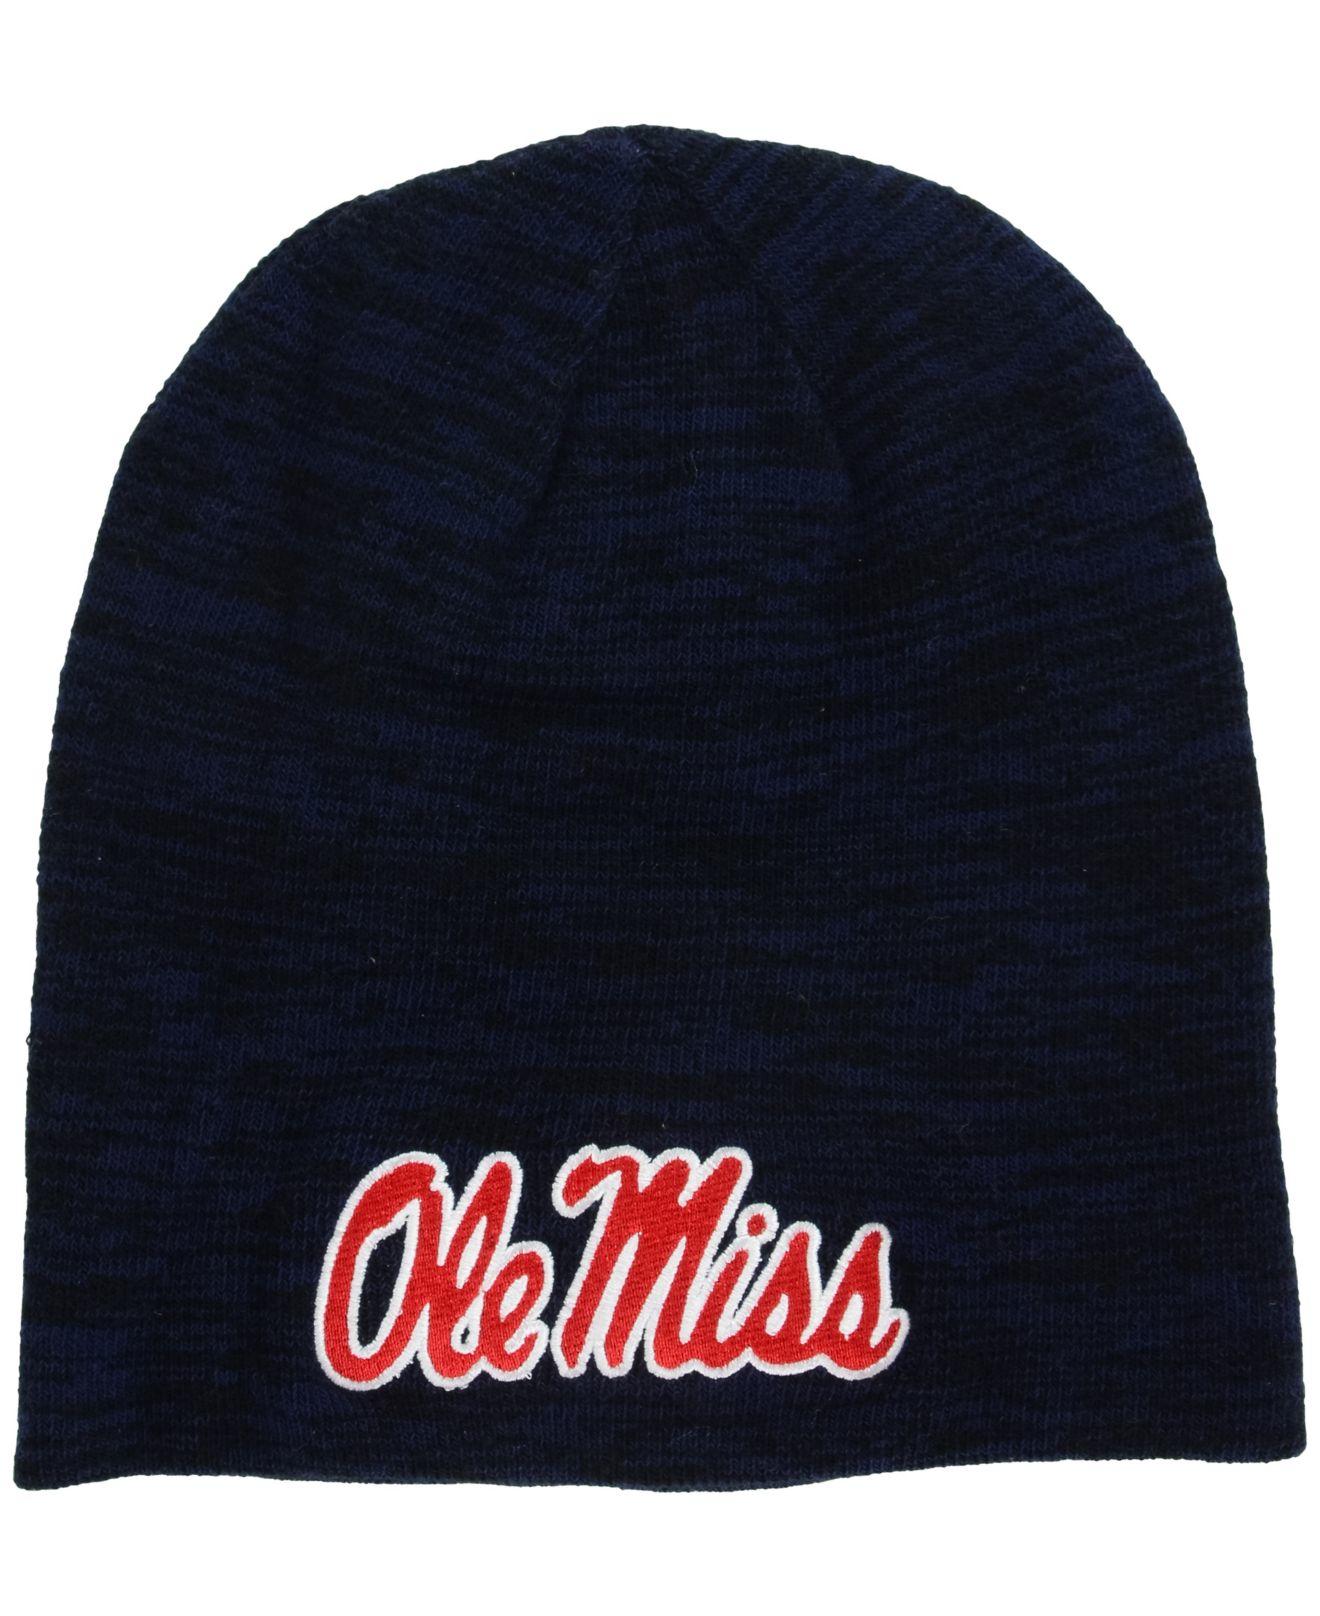 on sale 87566 c50dd Nike Mississippi Rebels Reversible Beanie Knit Hat in Blue for Men ...